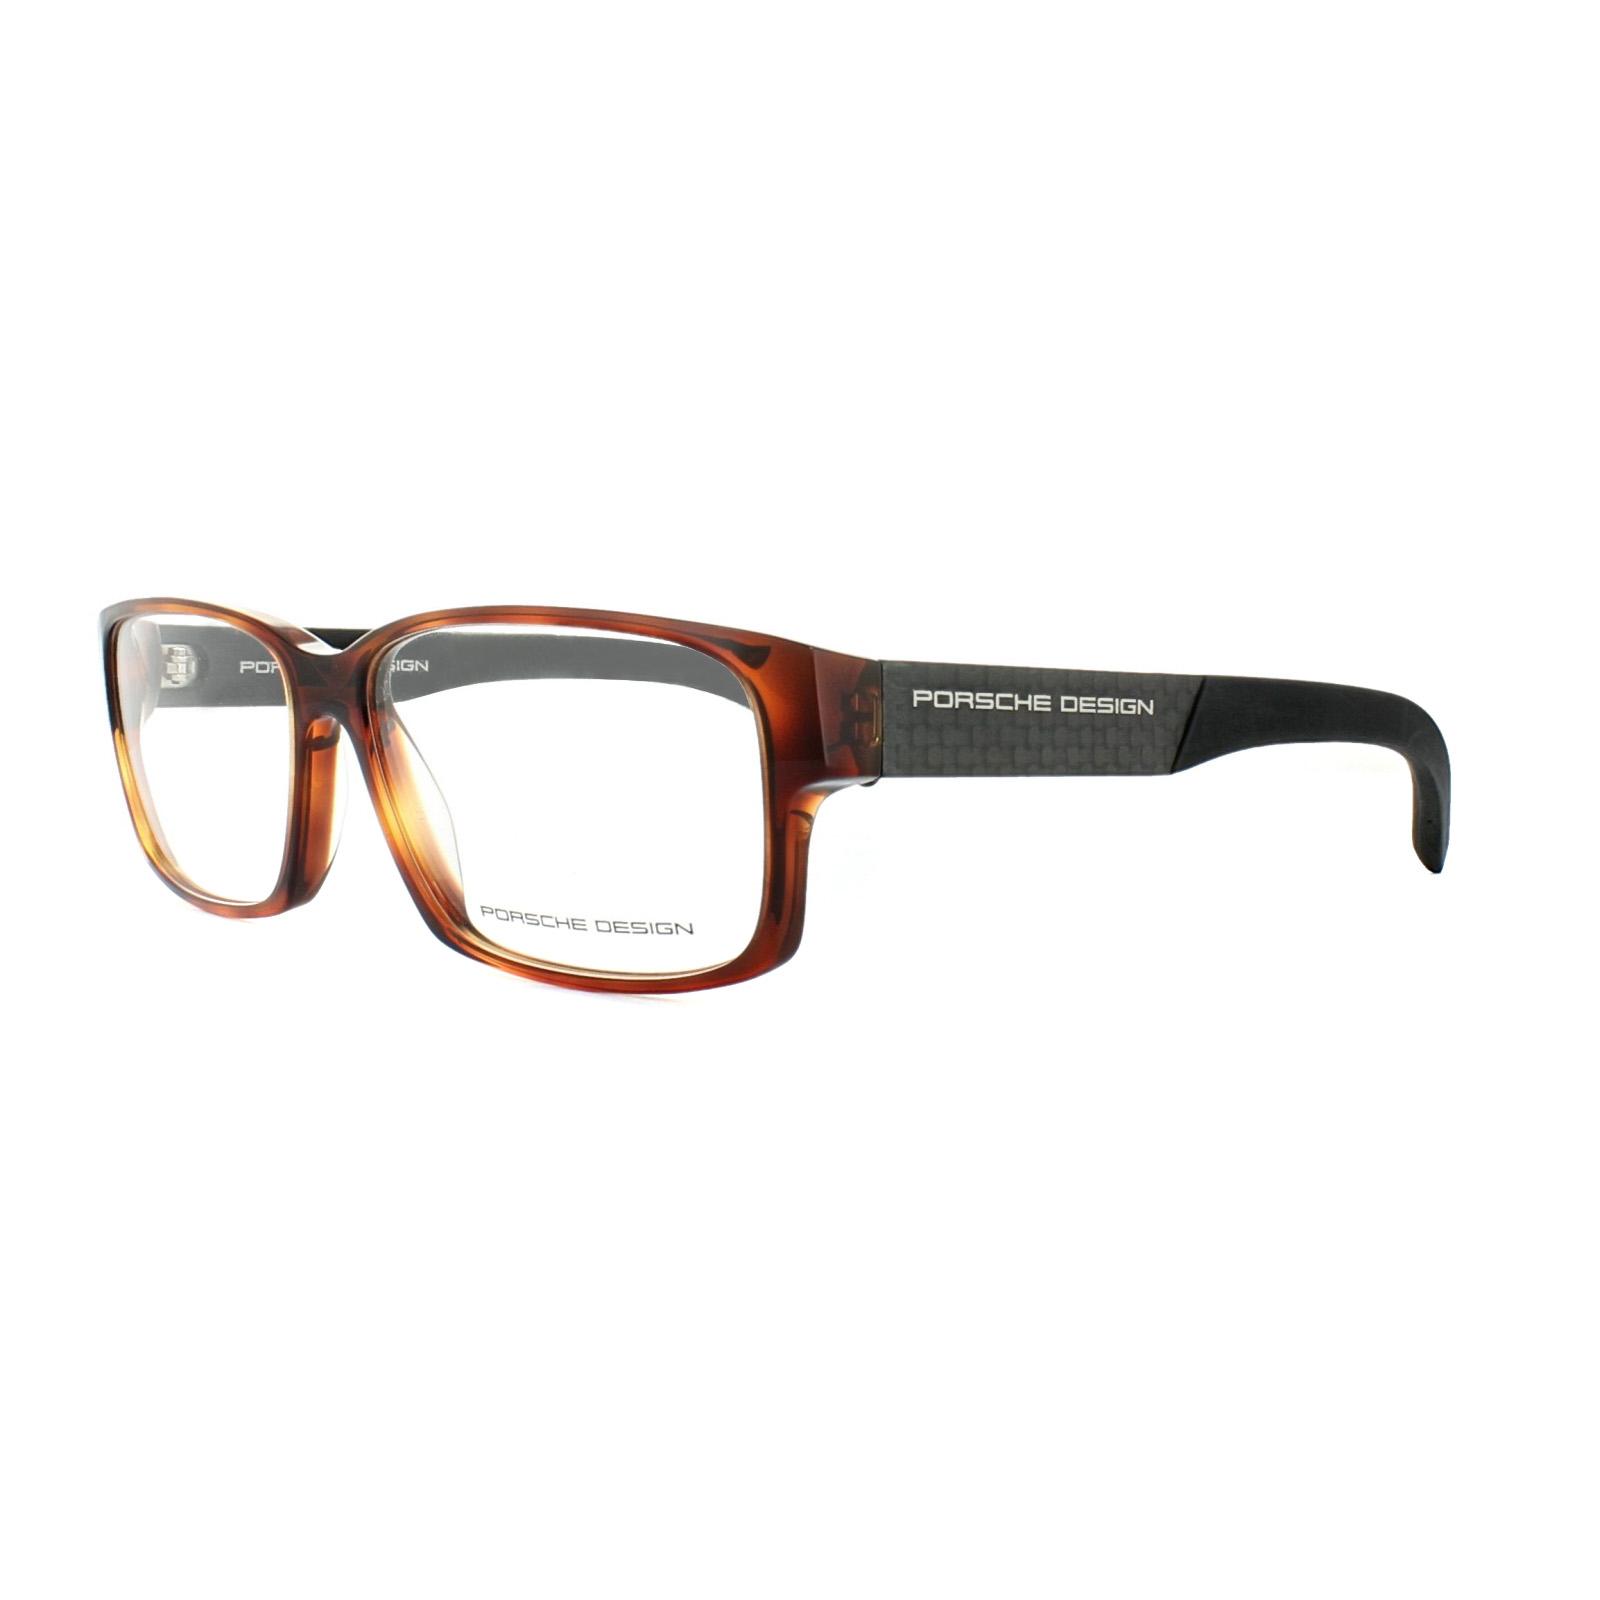 ebedf899217 Porsche Design Glasses Frames P8241 D Havana Black 4046901711450